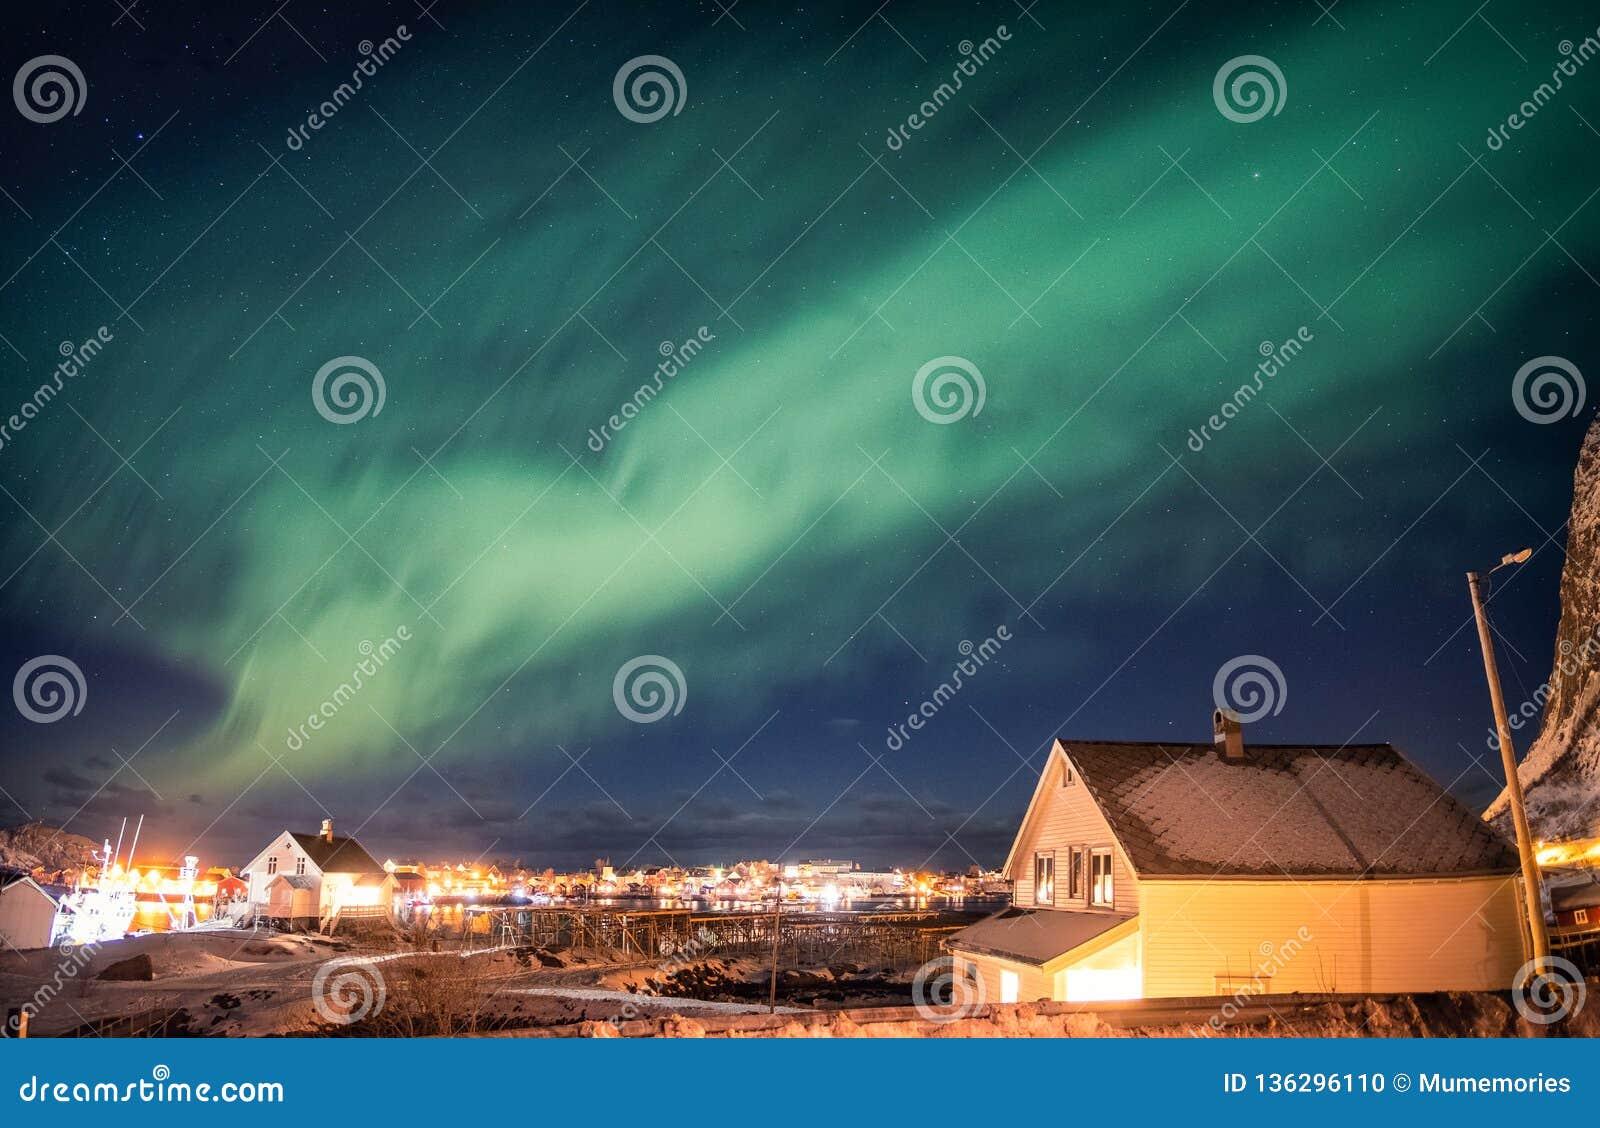 Aurora borealis-Tanzen über skandinavischem Dorf